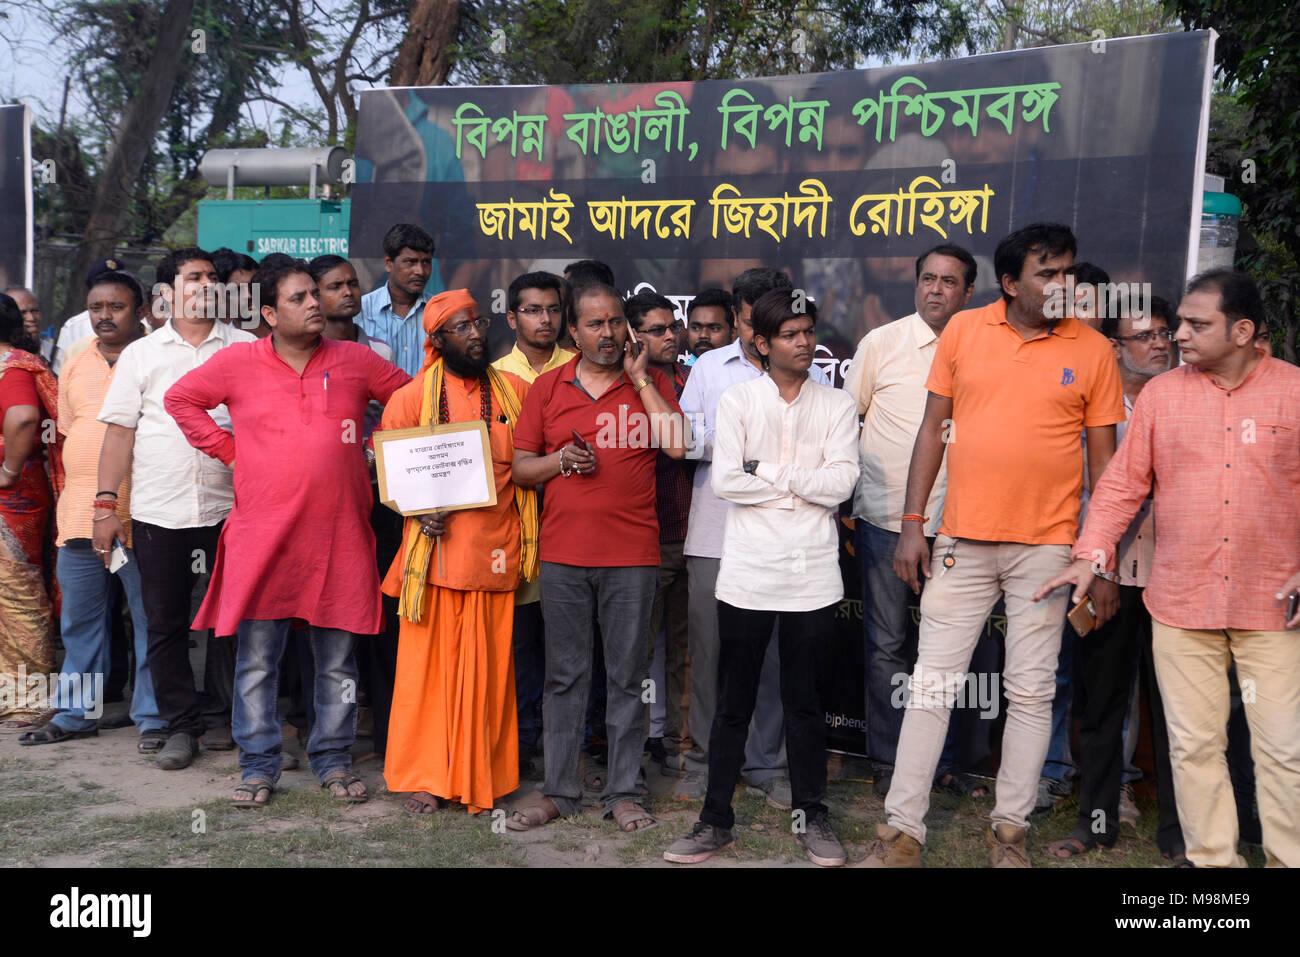 Demonstration For Rohingya Stock Photos & Demonstration For